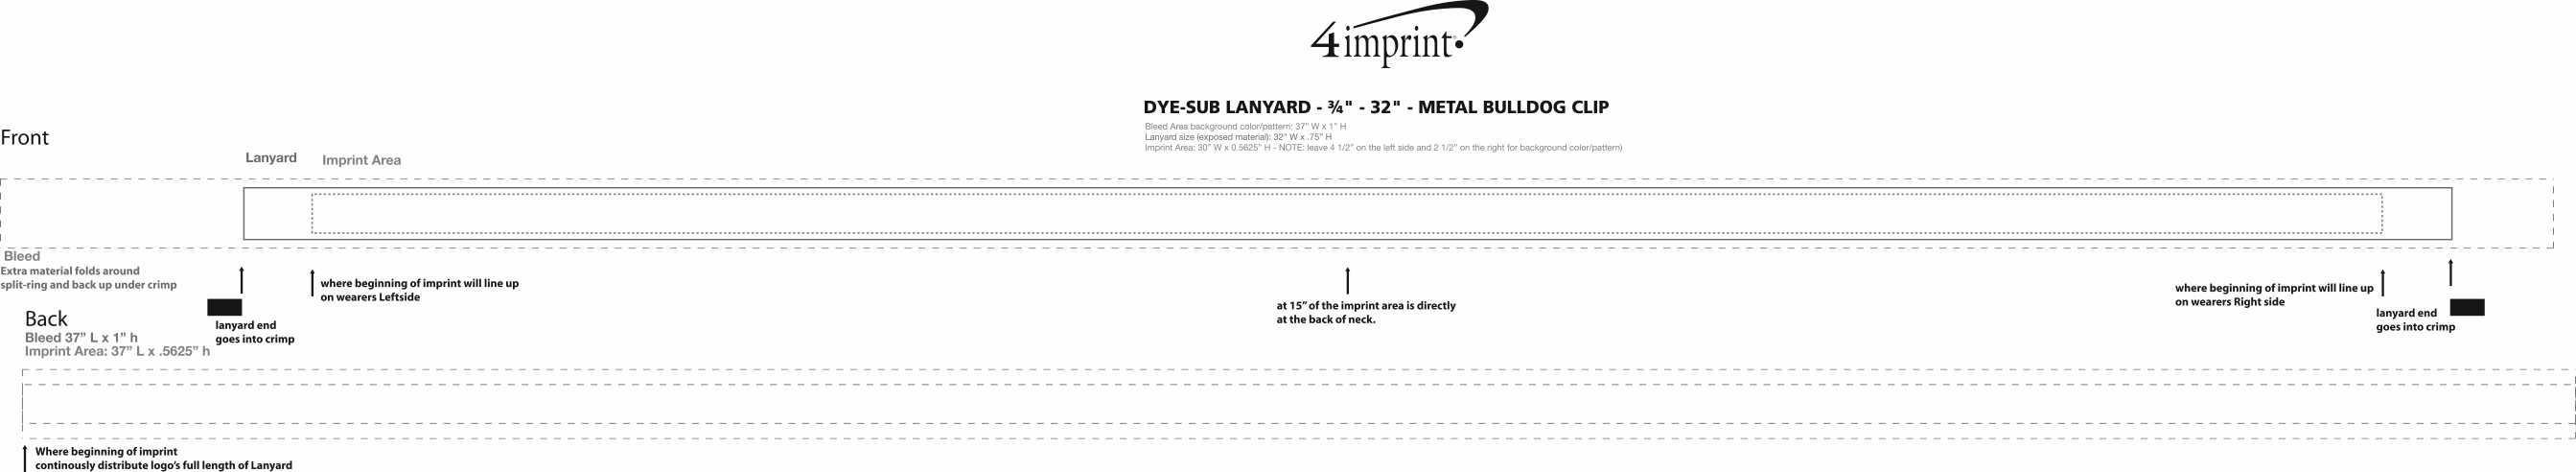 "Imprint Area of Dye-Sub Lanyard - 3/4"" - 32"" - Metal Bulldog Clip"